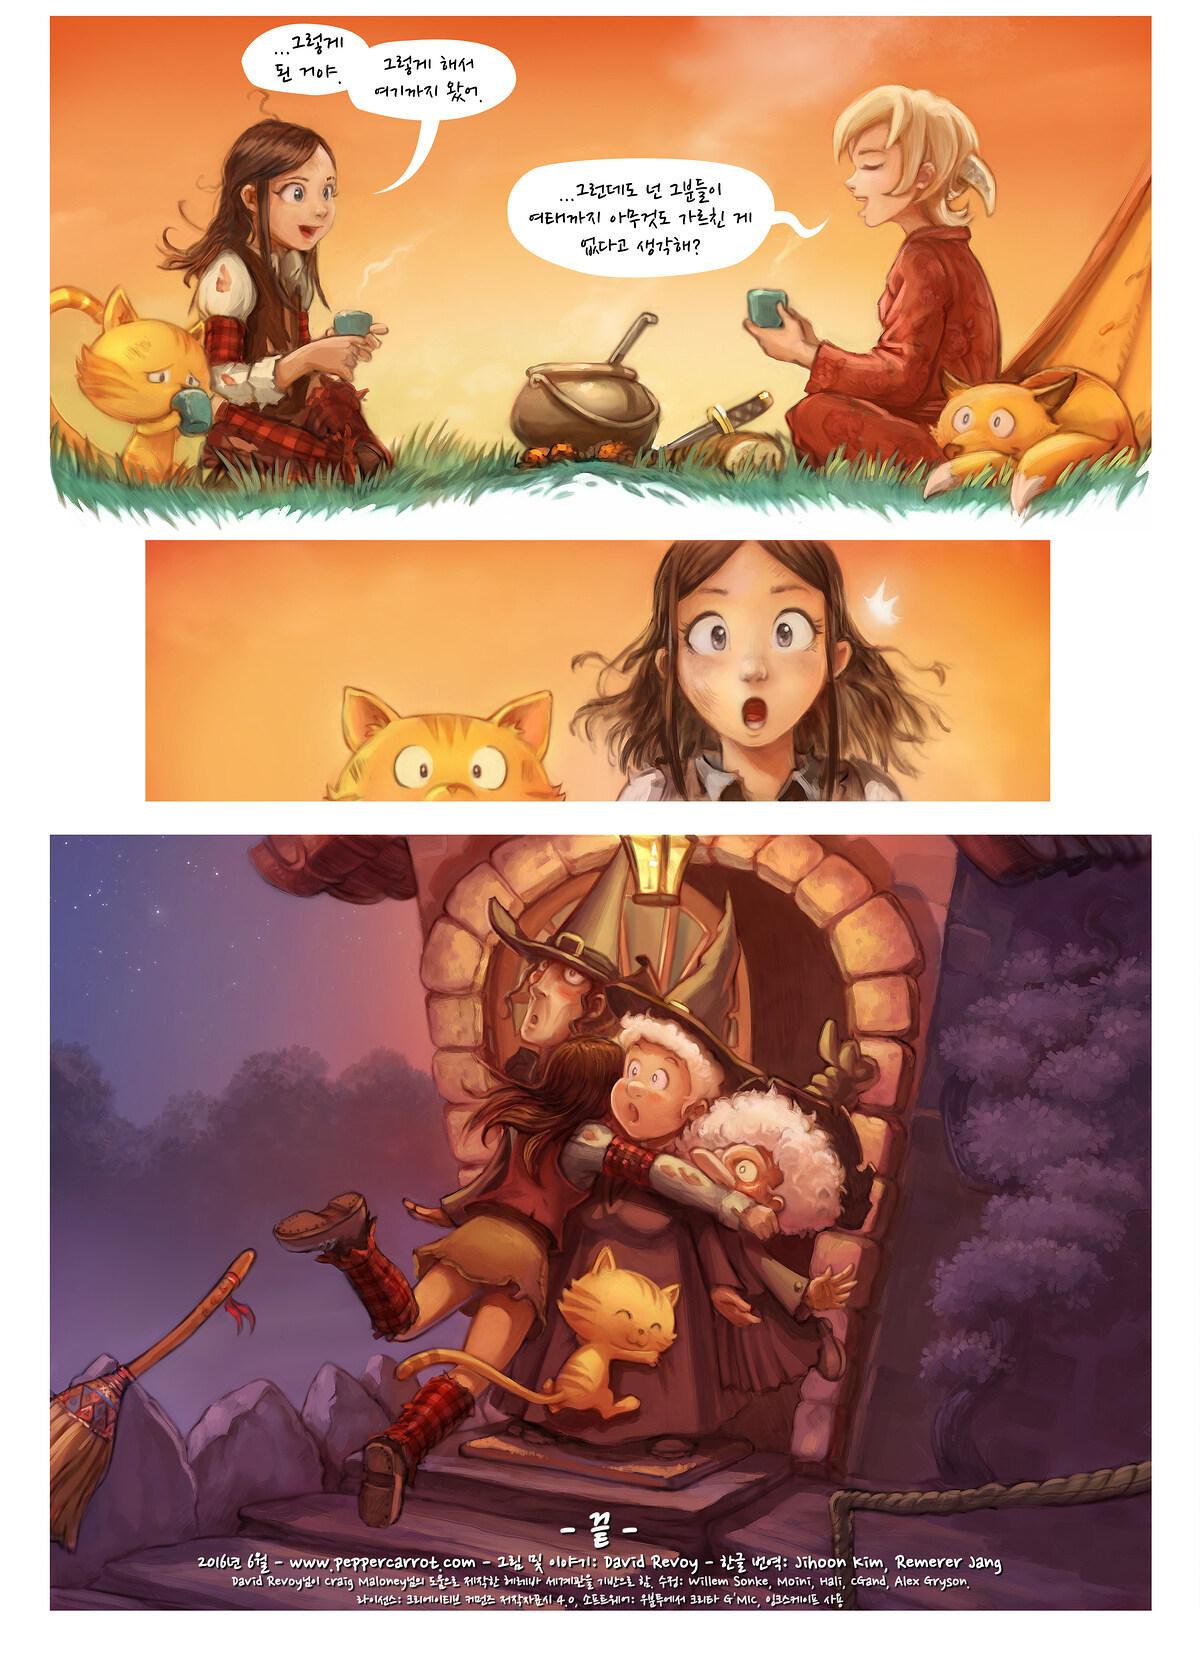 A webcomic page of Pepper&Carrot, 에피소드 17 [kr], 페이지 7